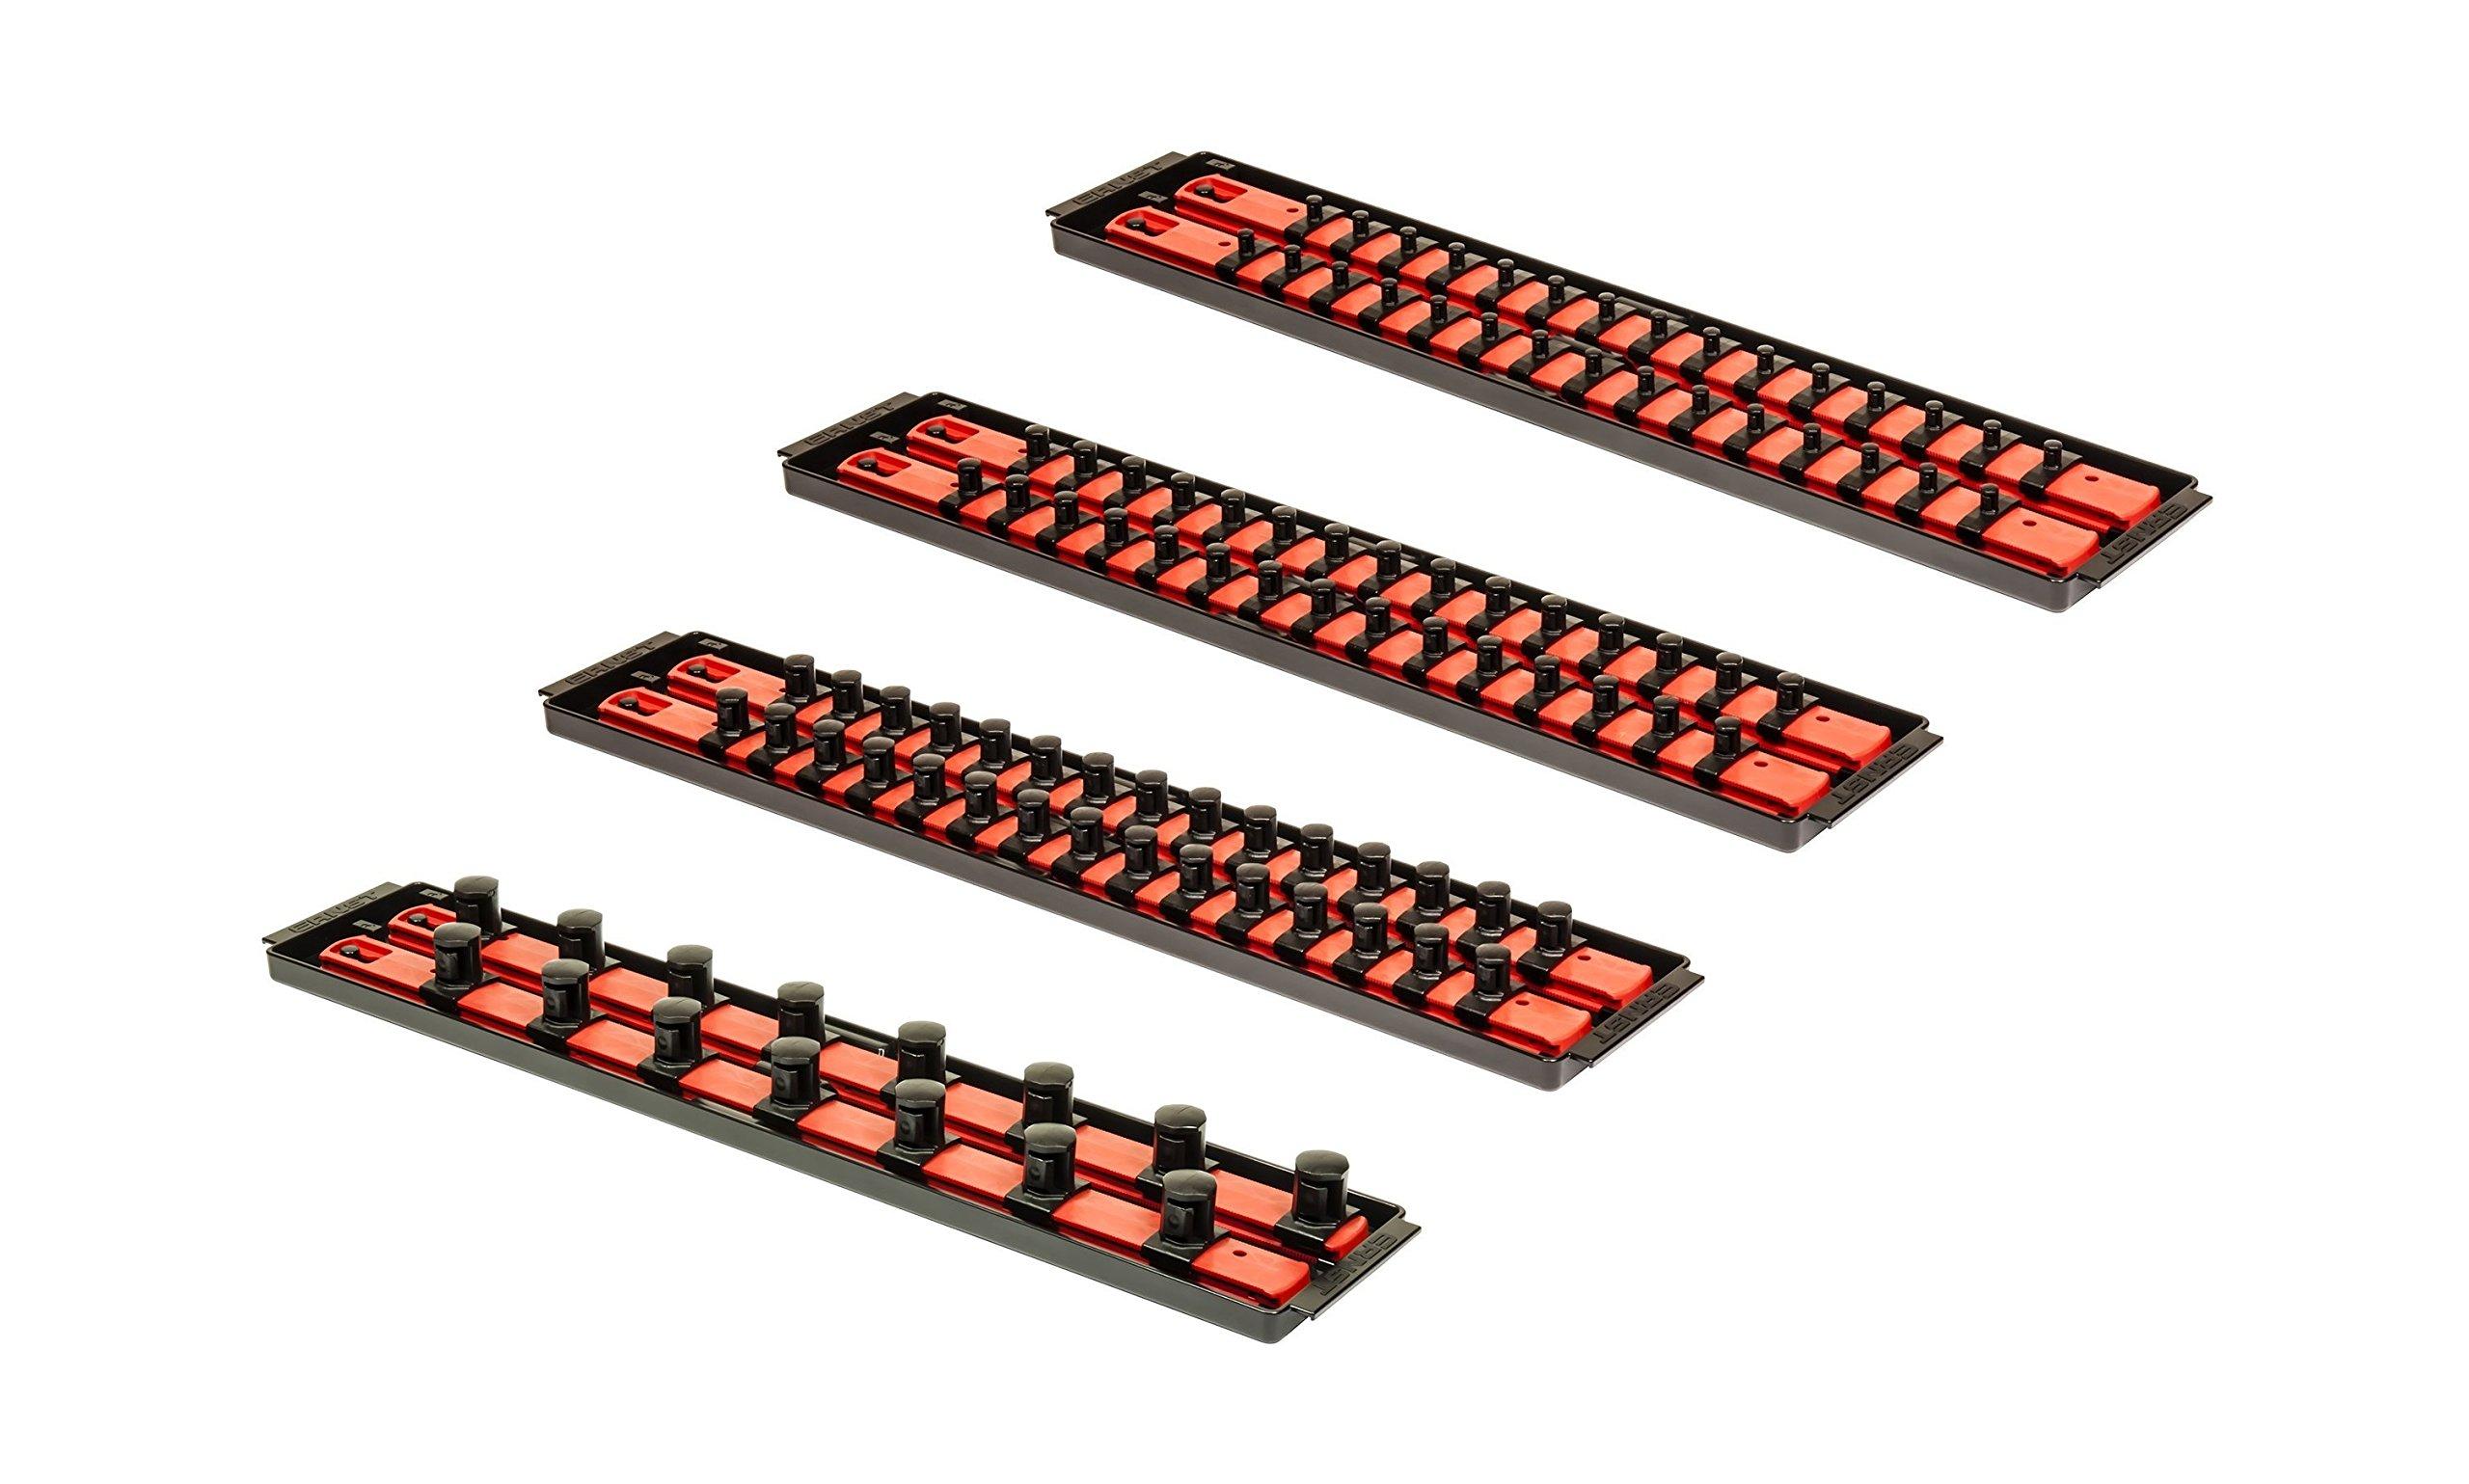 Ernst Mfg 8452+8453+8454+8458 Red Socket BOSS High-Density Tray Set w/8 Rails